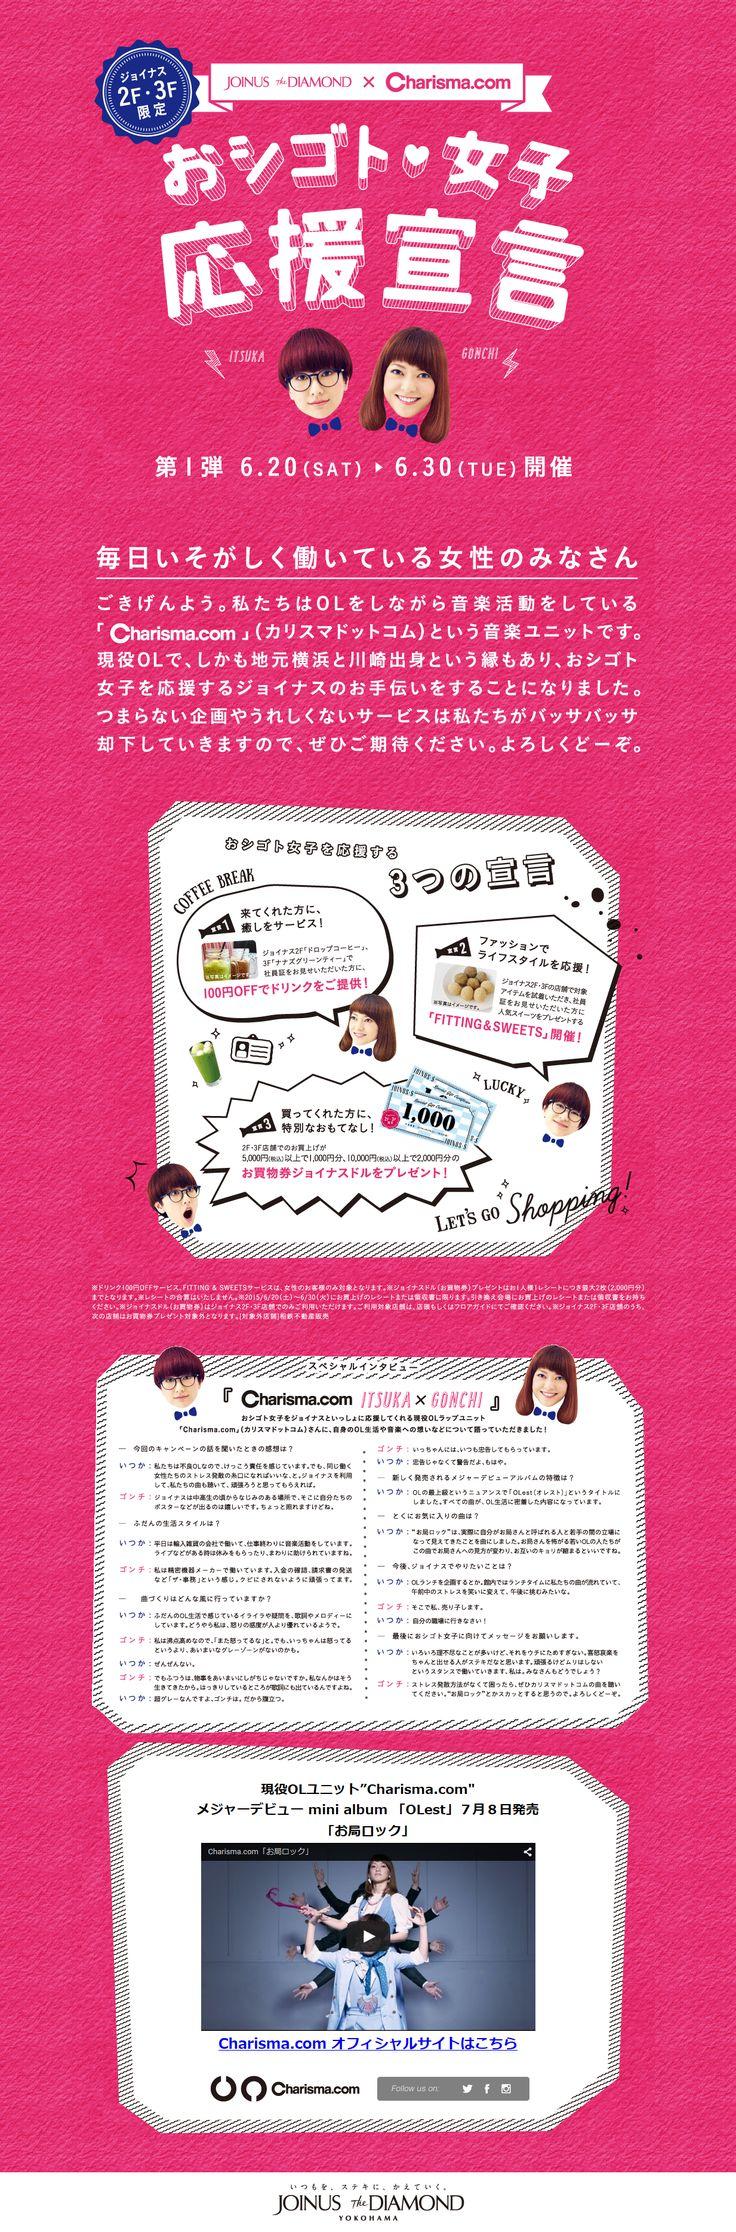 http://www.sotetsu-joinus.com/oshigotojyoshi/